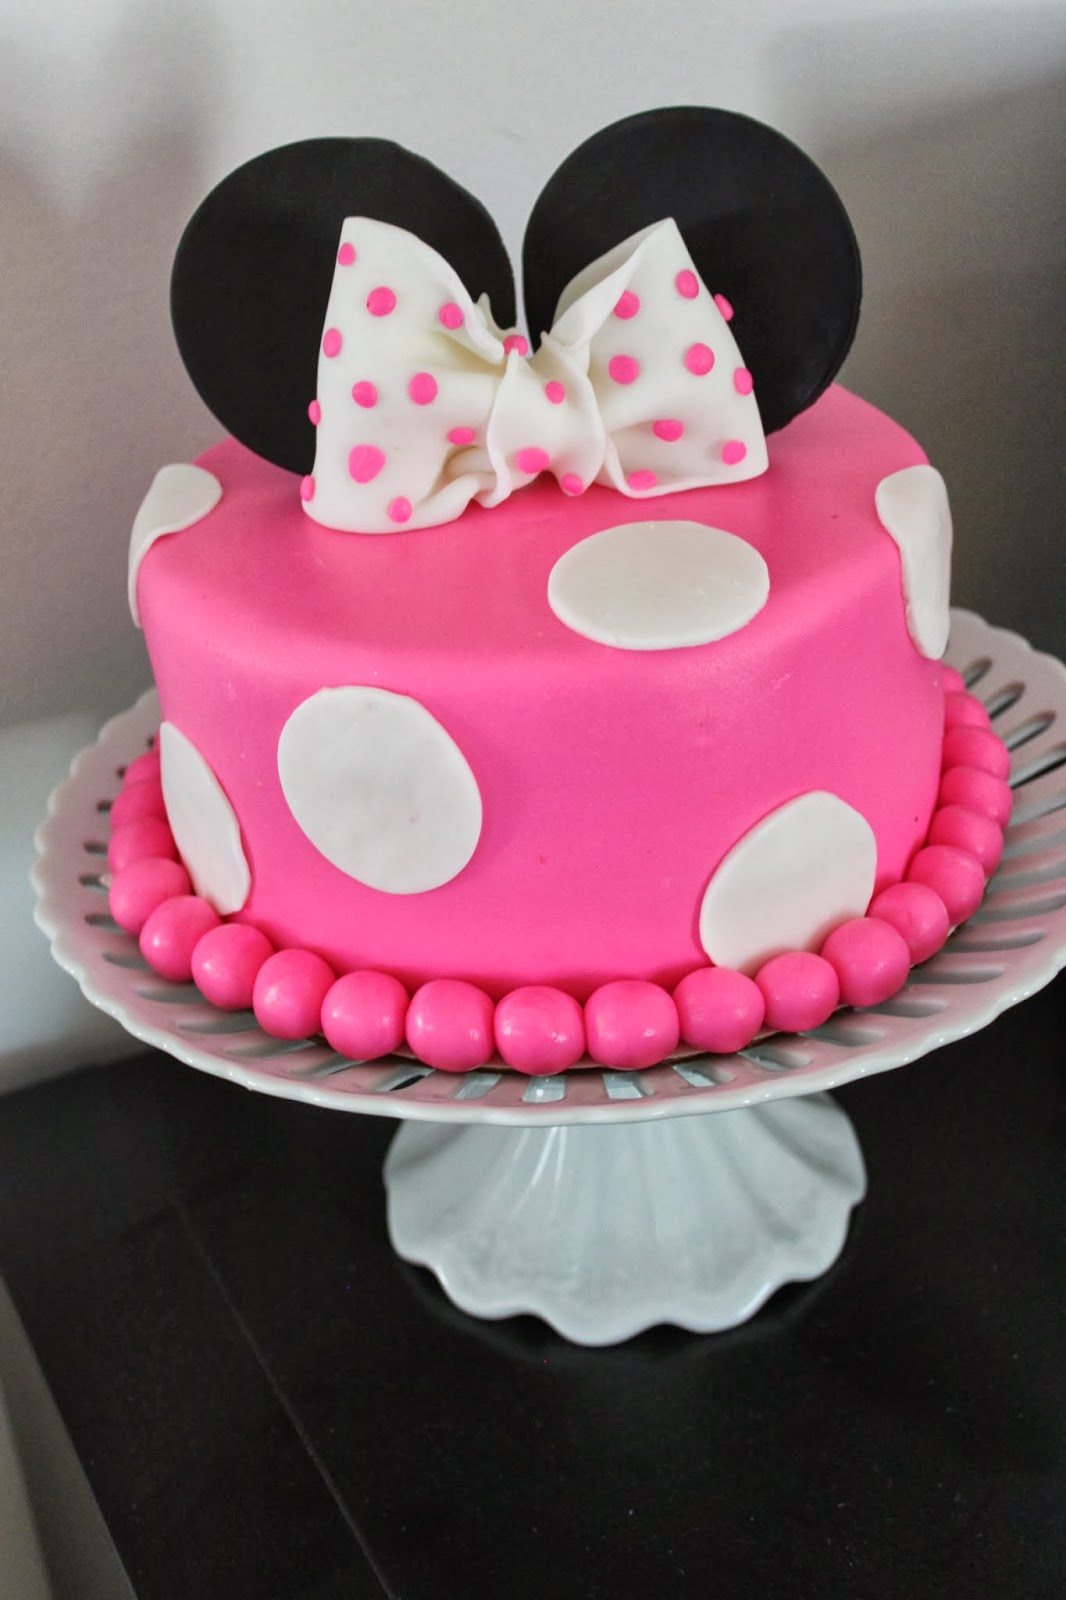 Victoria S Piece A Cake September 2013 Cakes